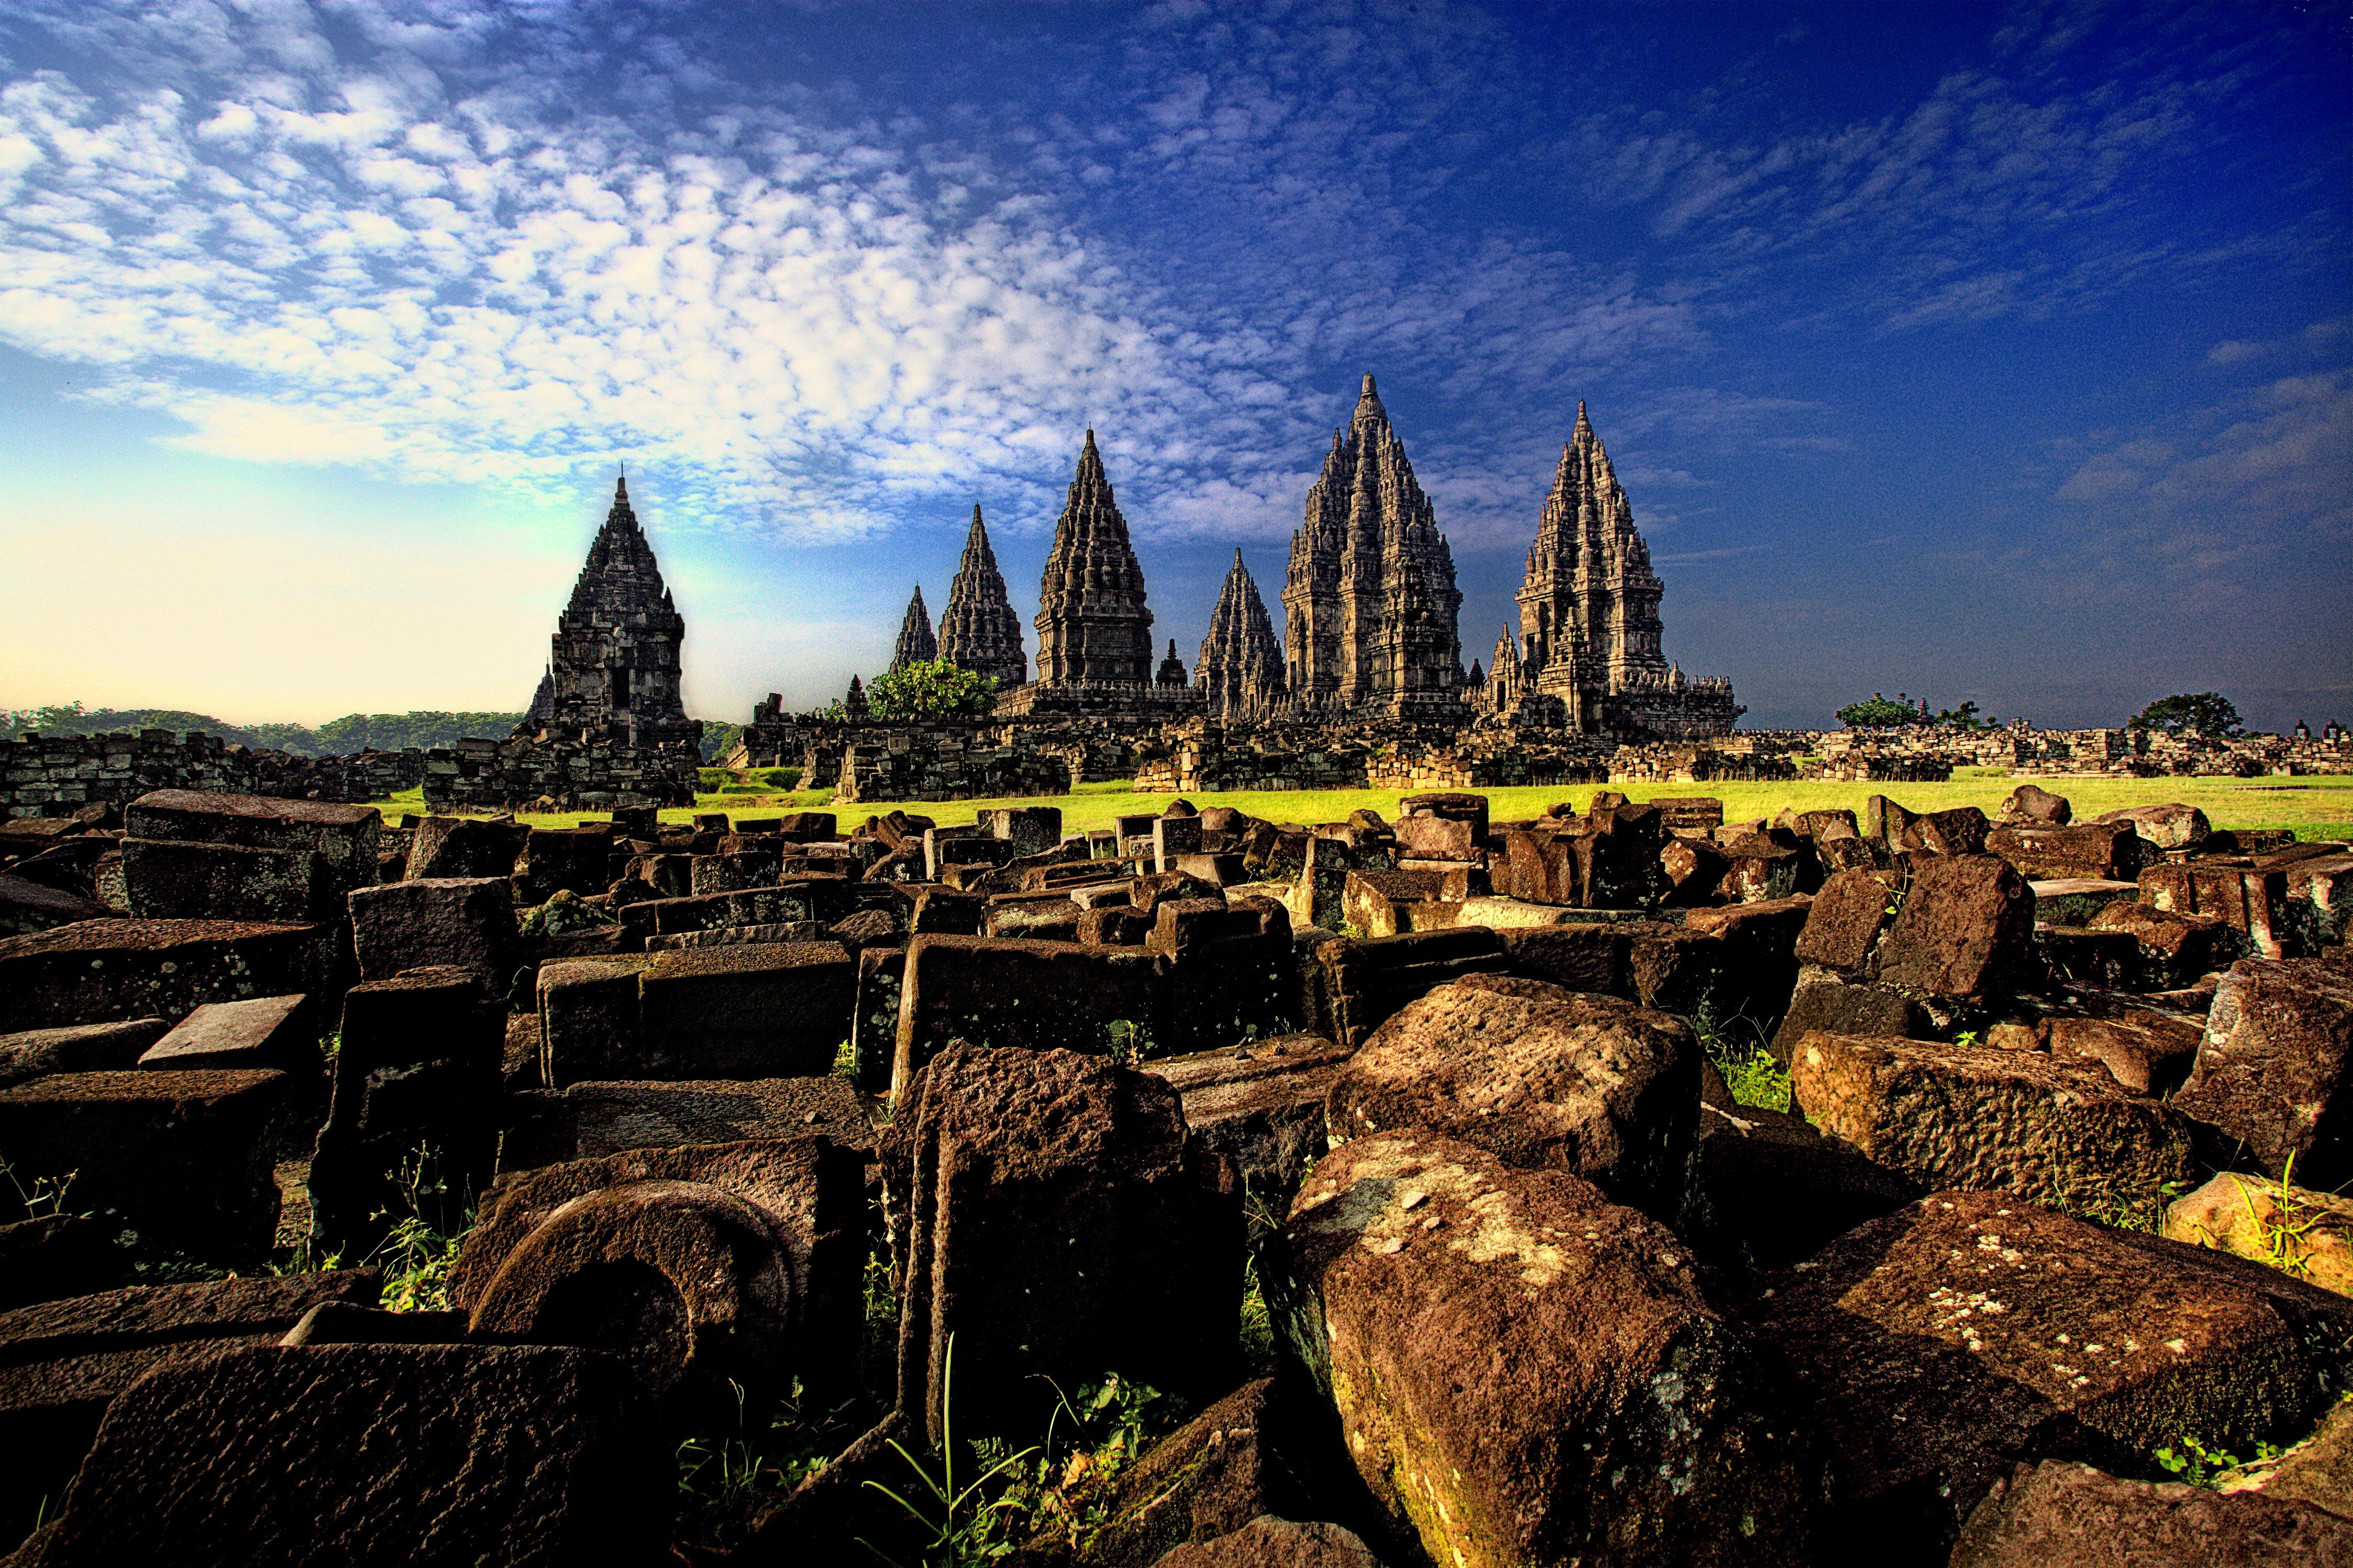 5 Tempat Wisata di Yogyakarta yang Wajib Dikunjungi